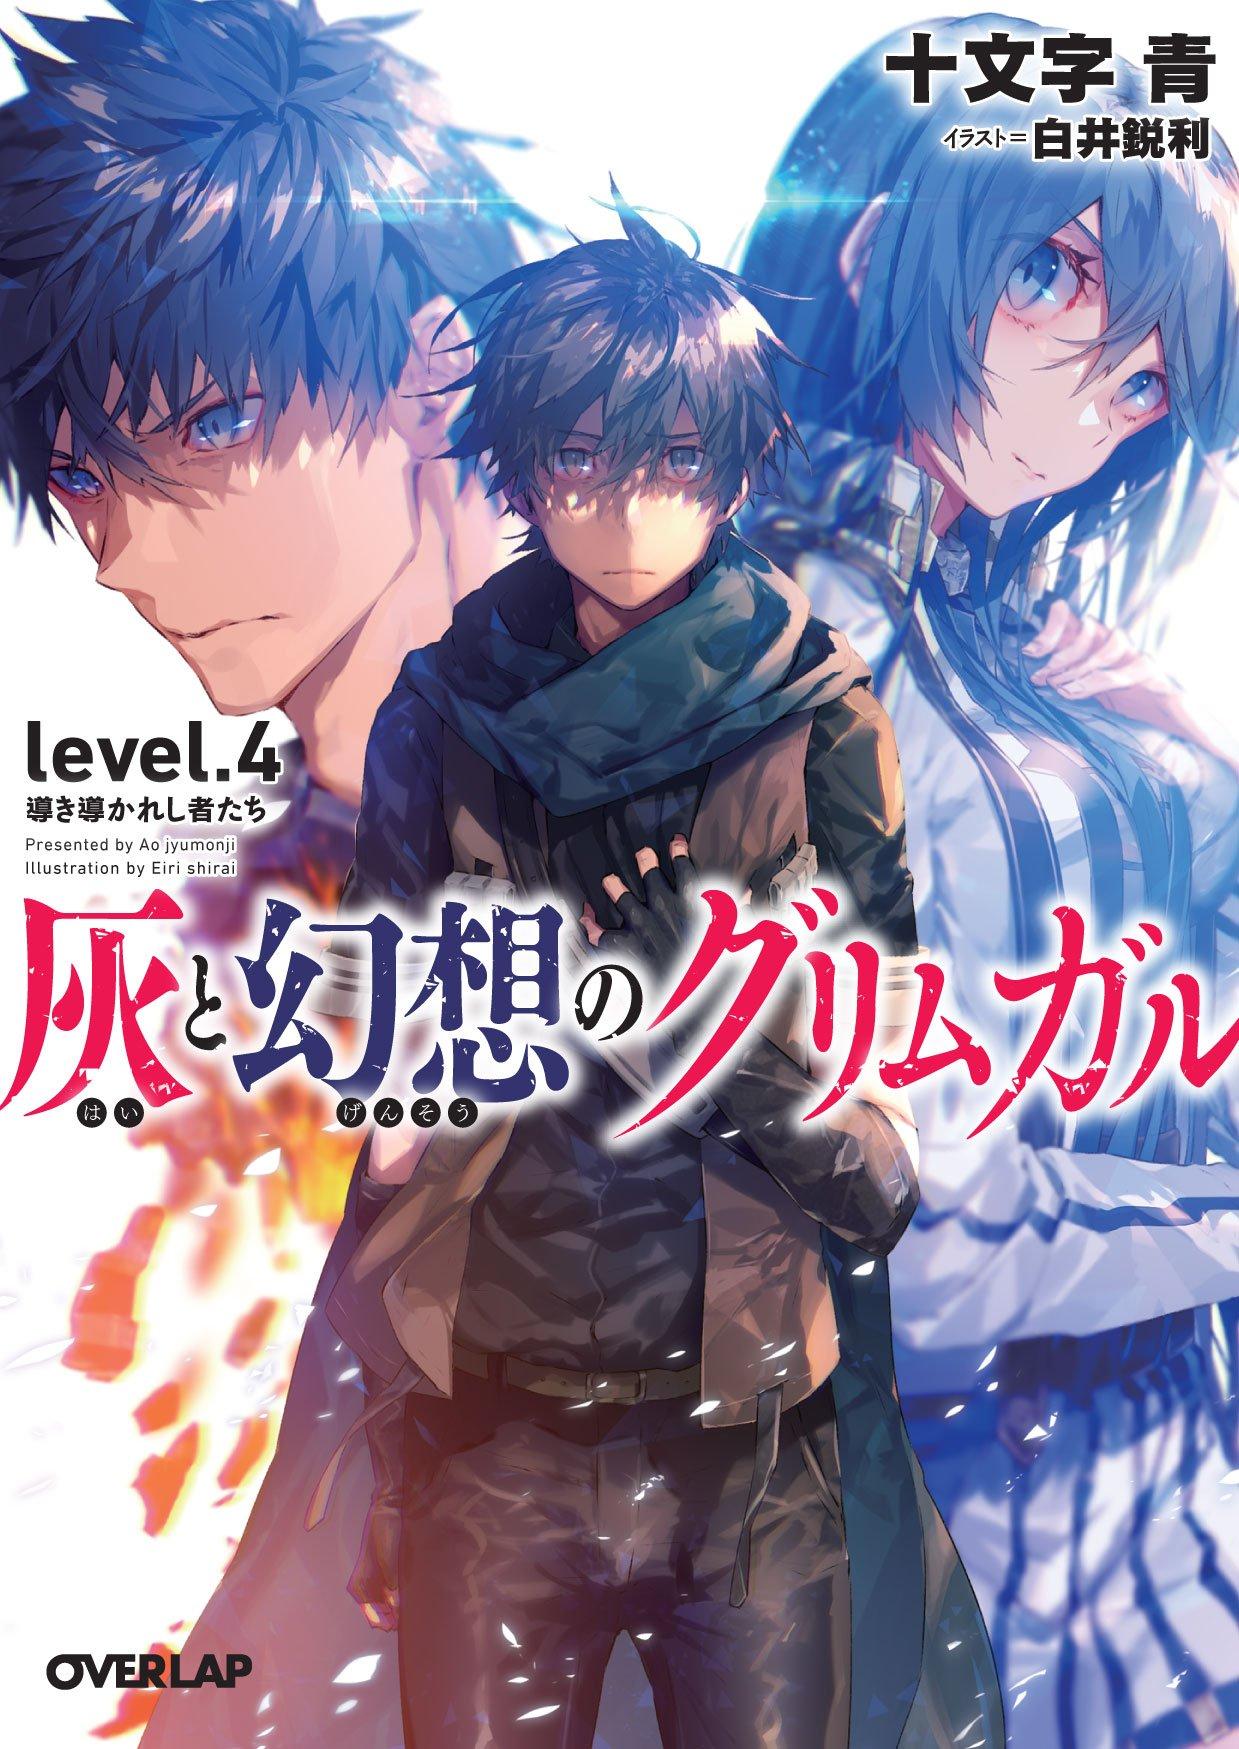 Read Online 灰と幻想のグリムガル level.4 導き導かれし者たち (オーバーラップ文庫) PDF